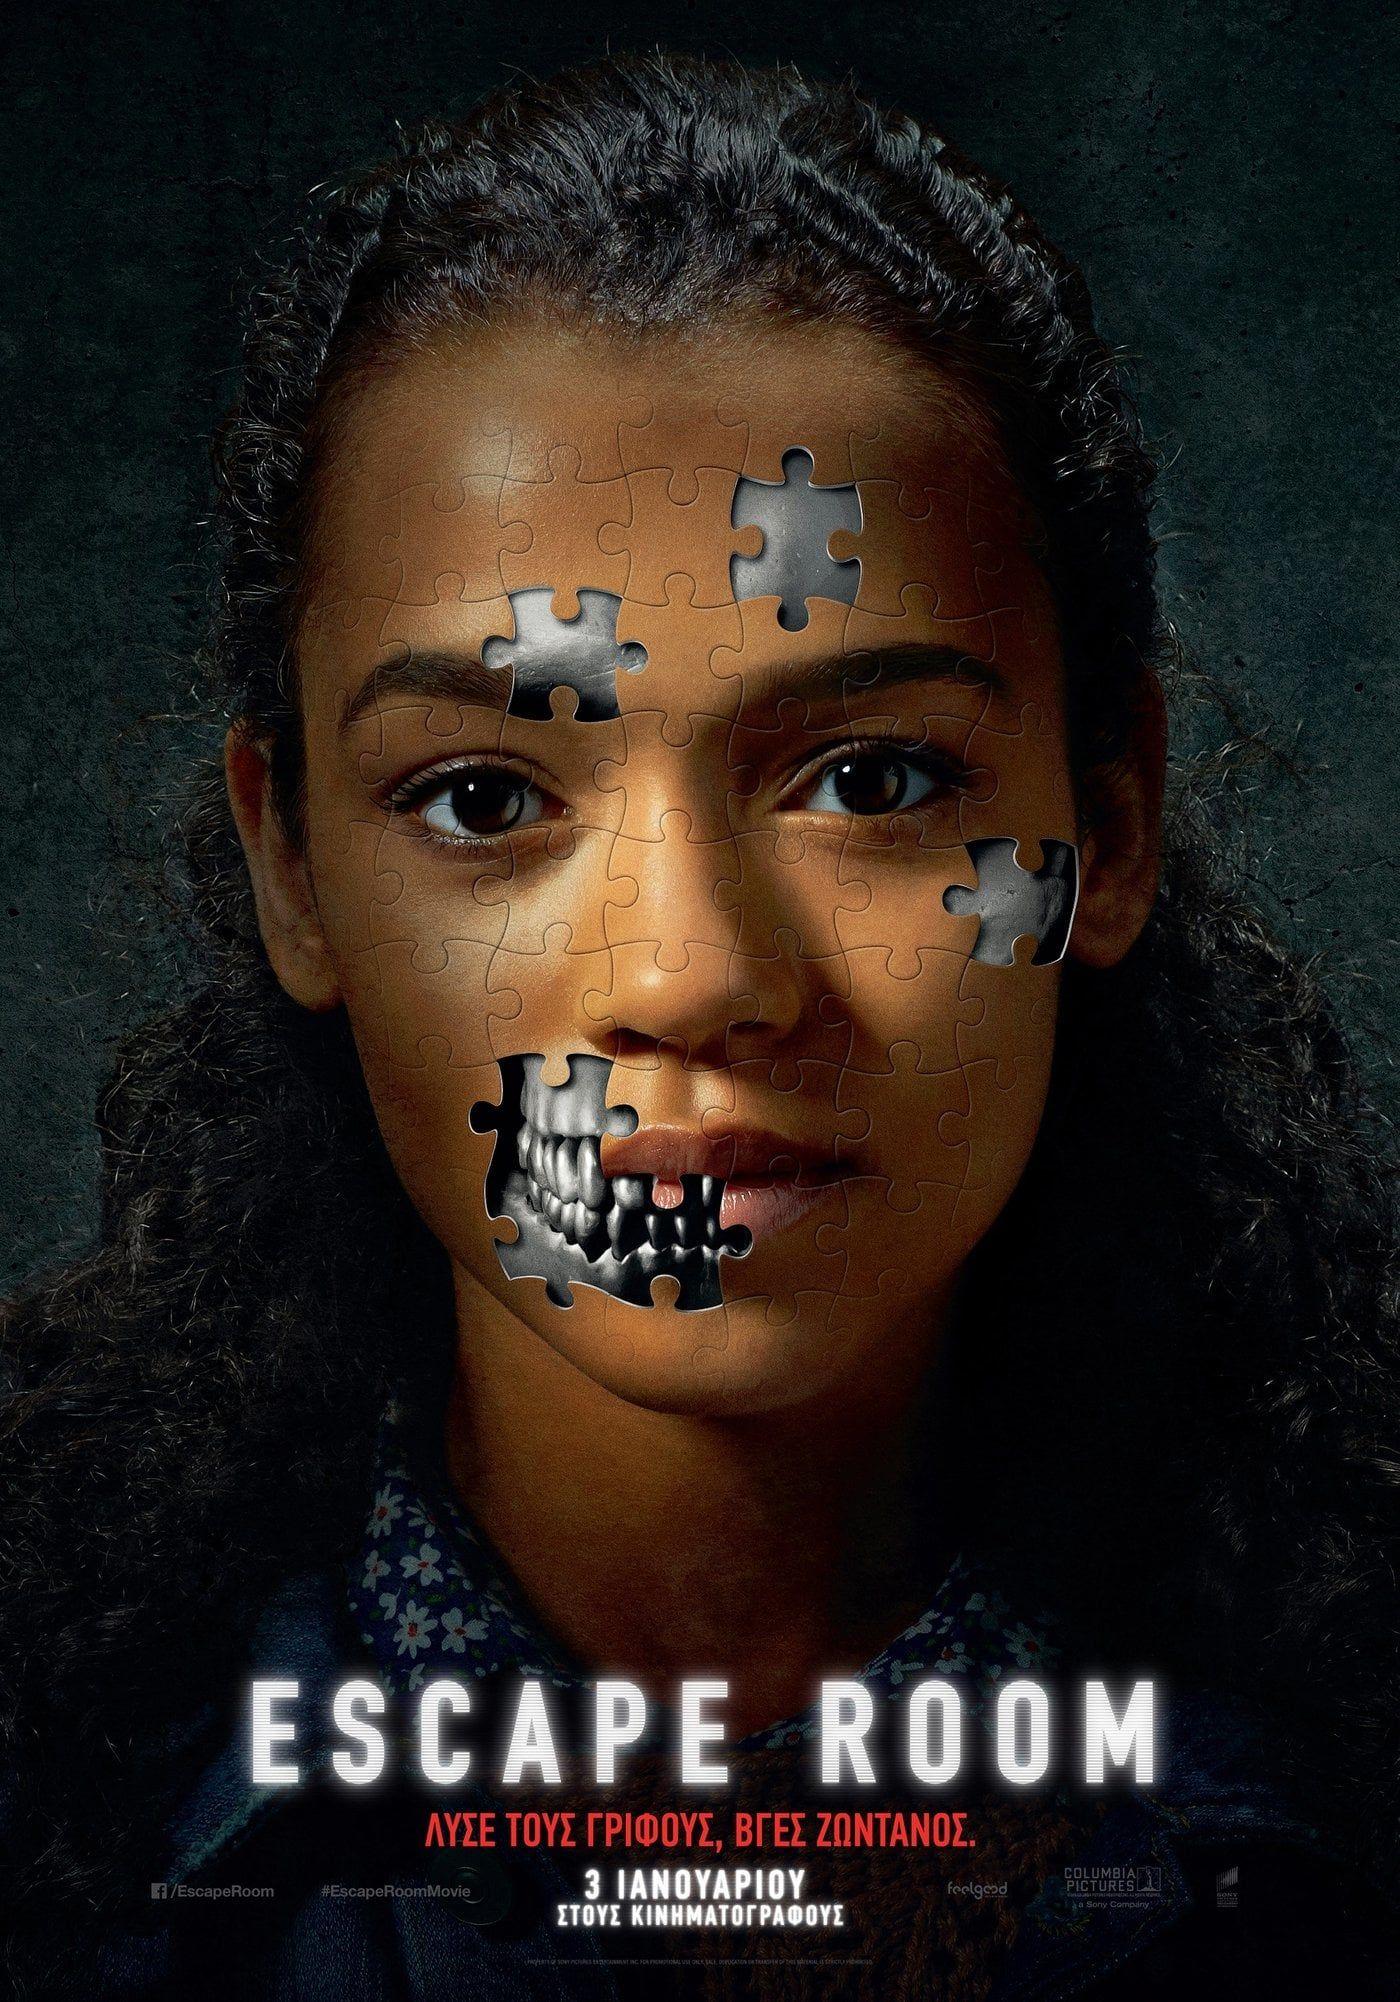 Escape Room Full Movie Online Free English 2019 Hd Q1080p Film Film Baru Film Barat